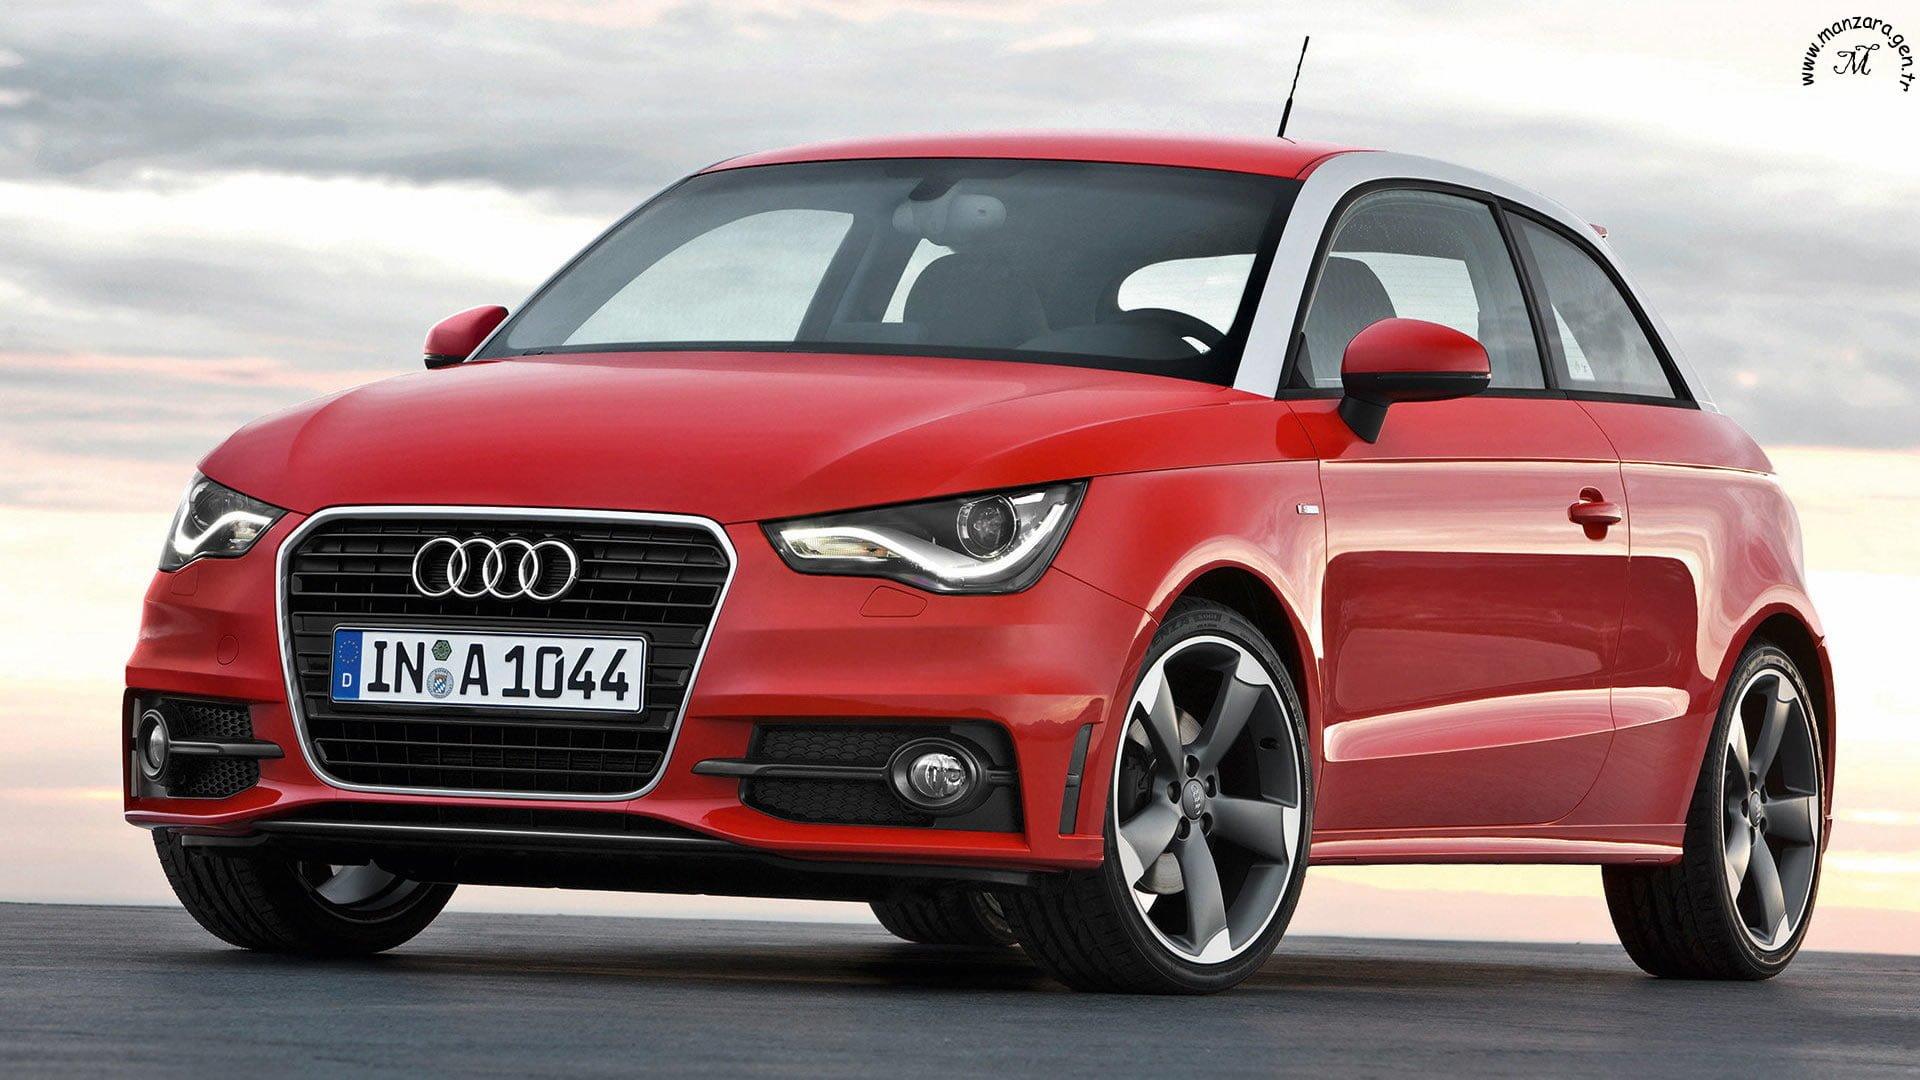 Audi A1 – 2011 – 5